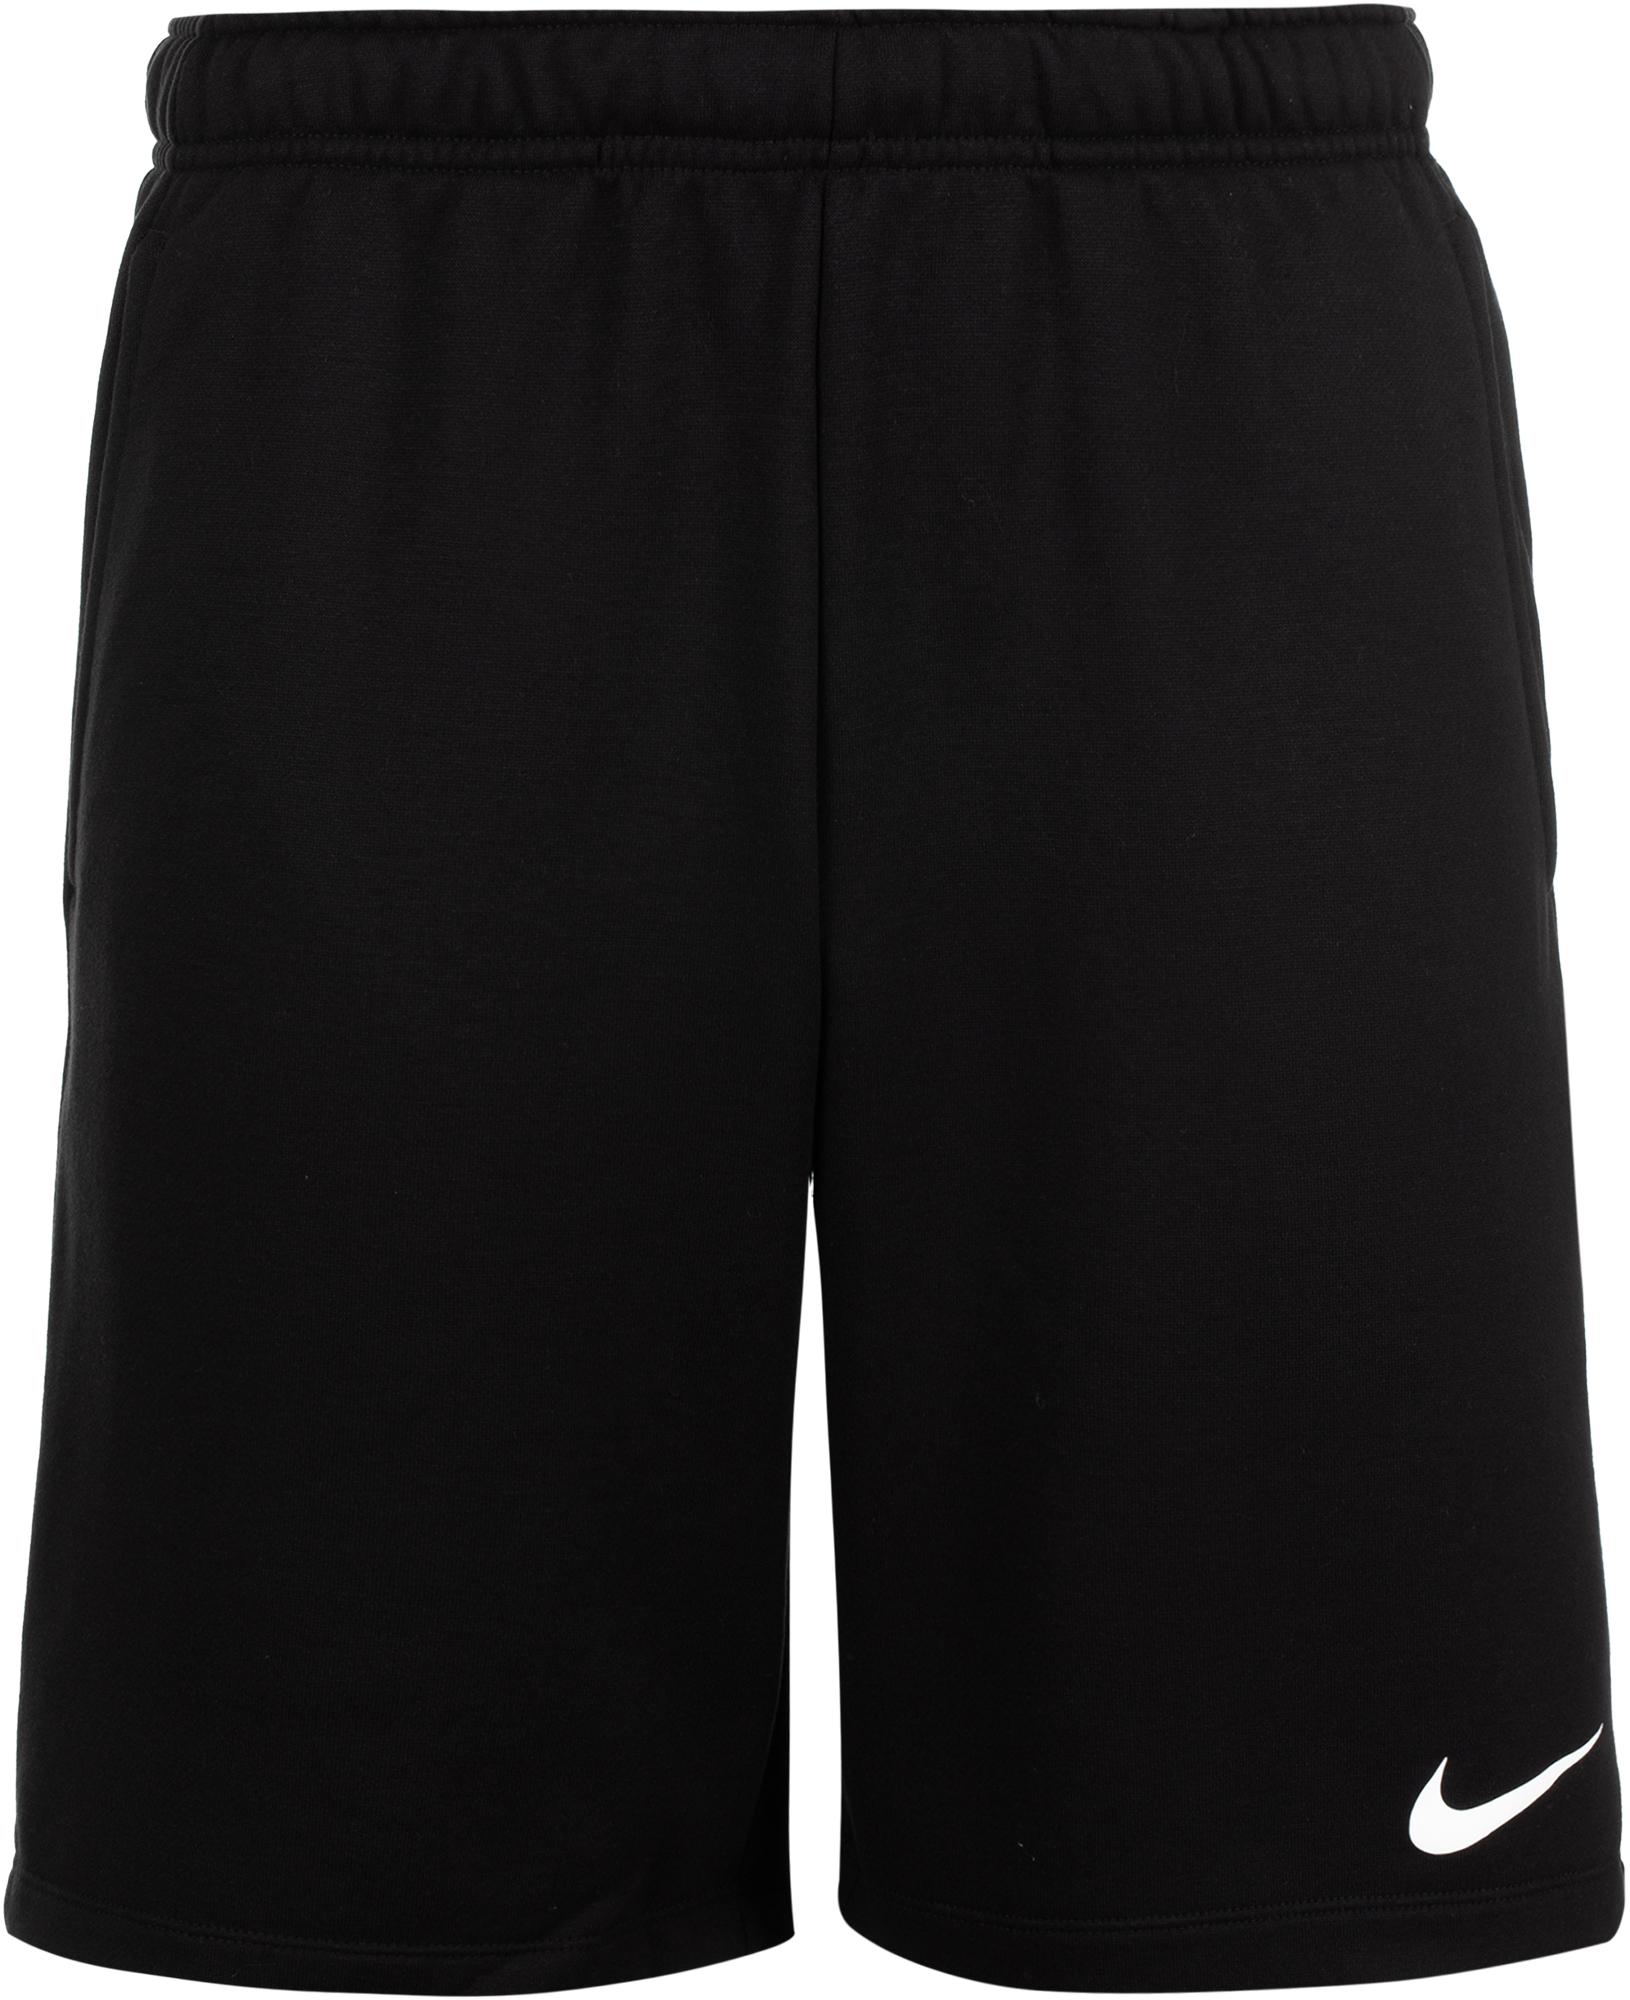 Nike Шорты мужские Dri-FIT, размер 54-56